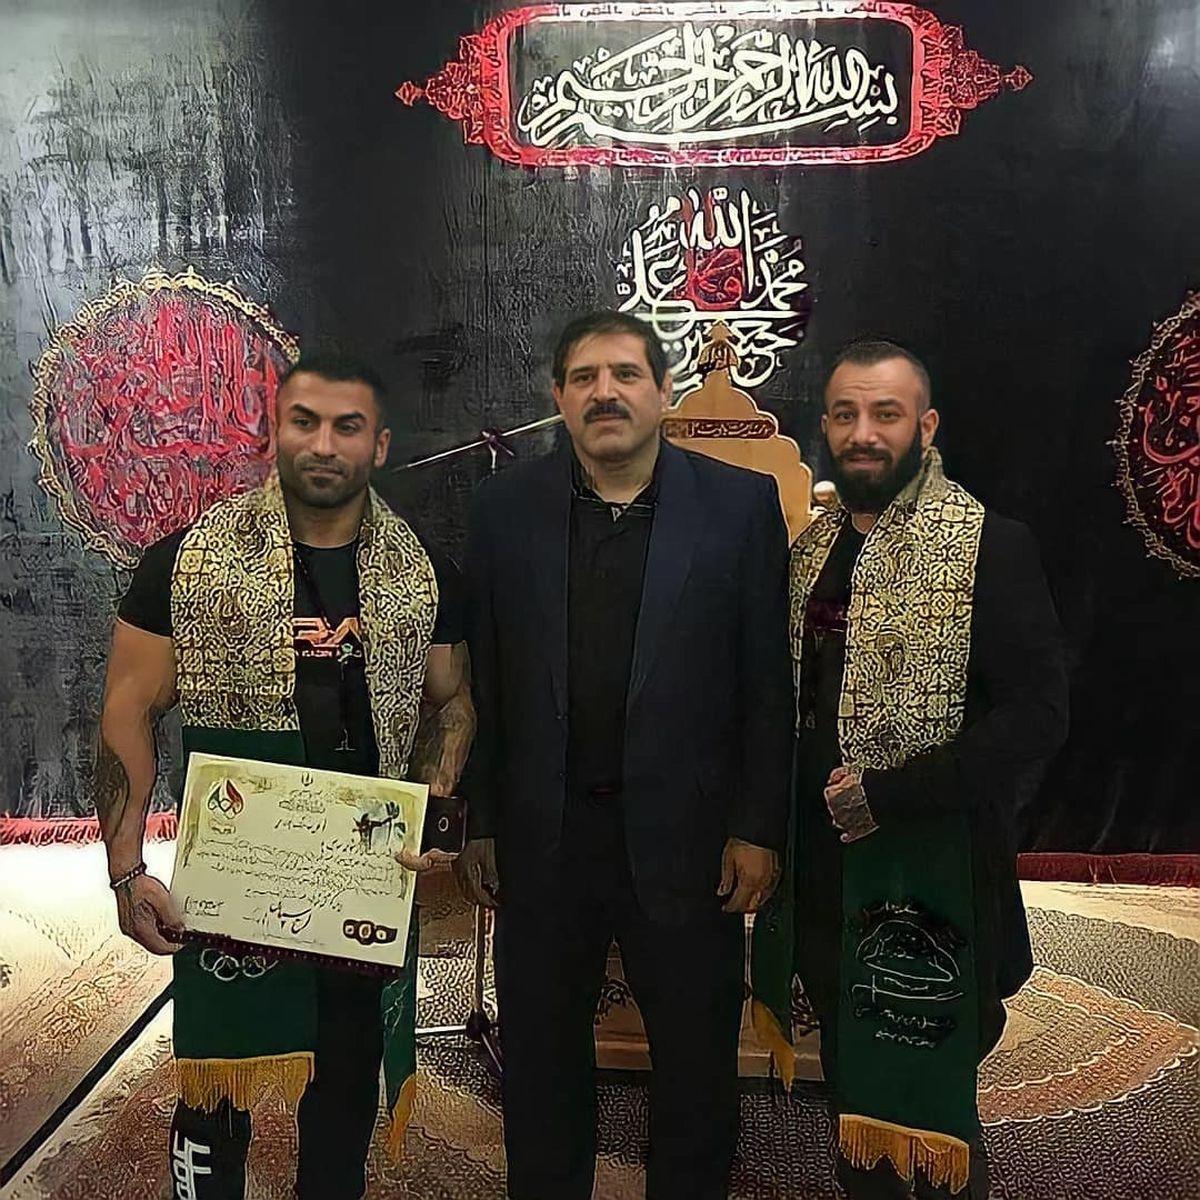 امیر تتلو در کنار عباس جدیدی + عکس